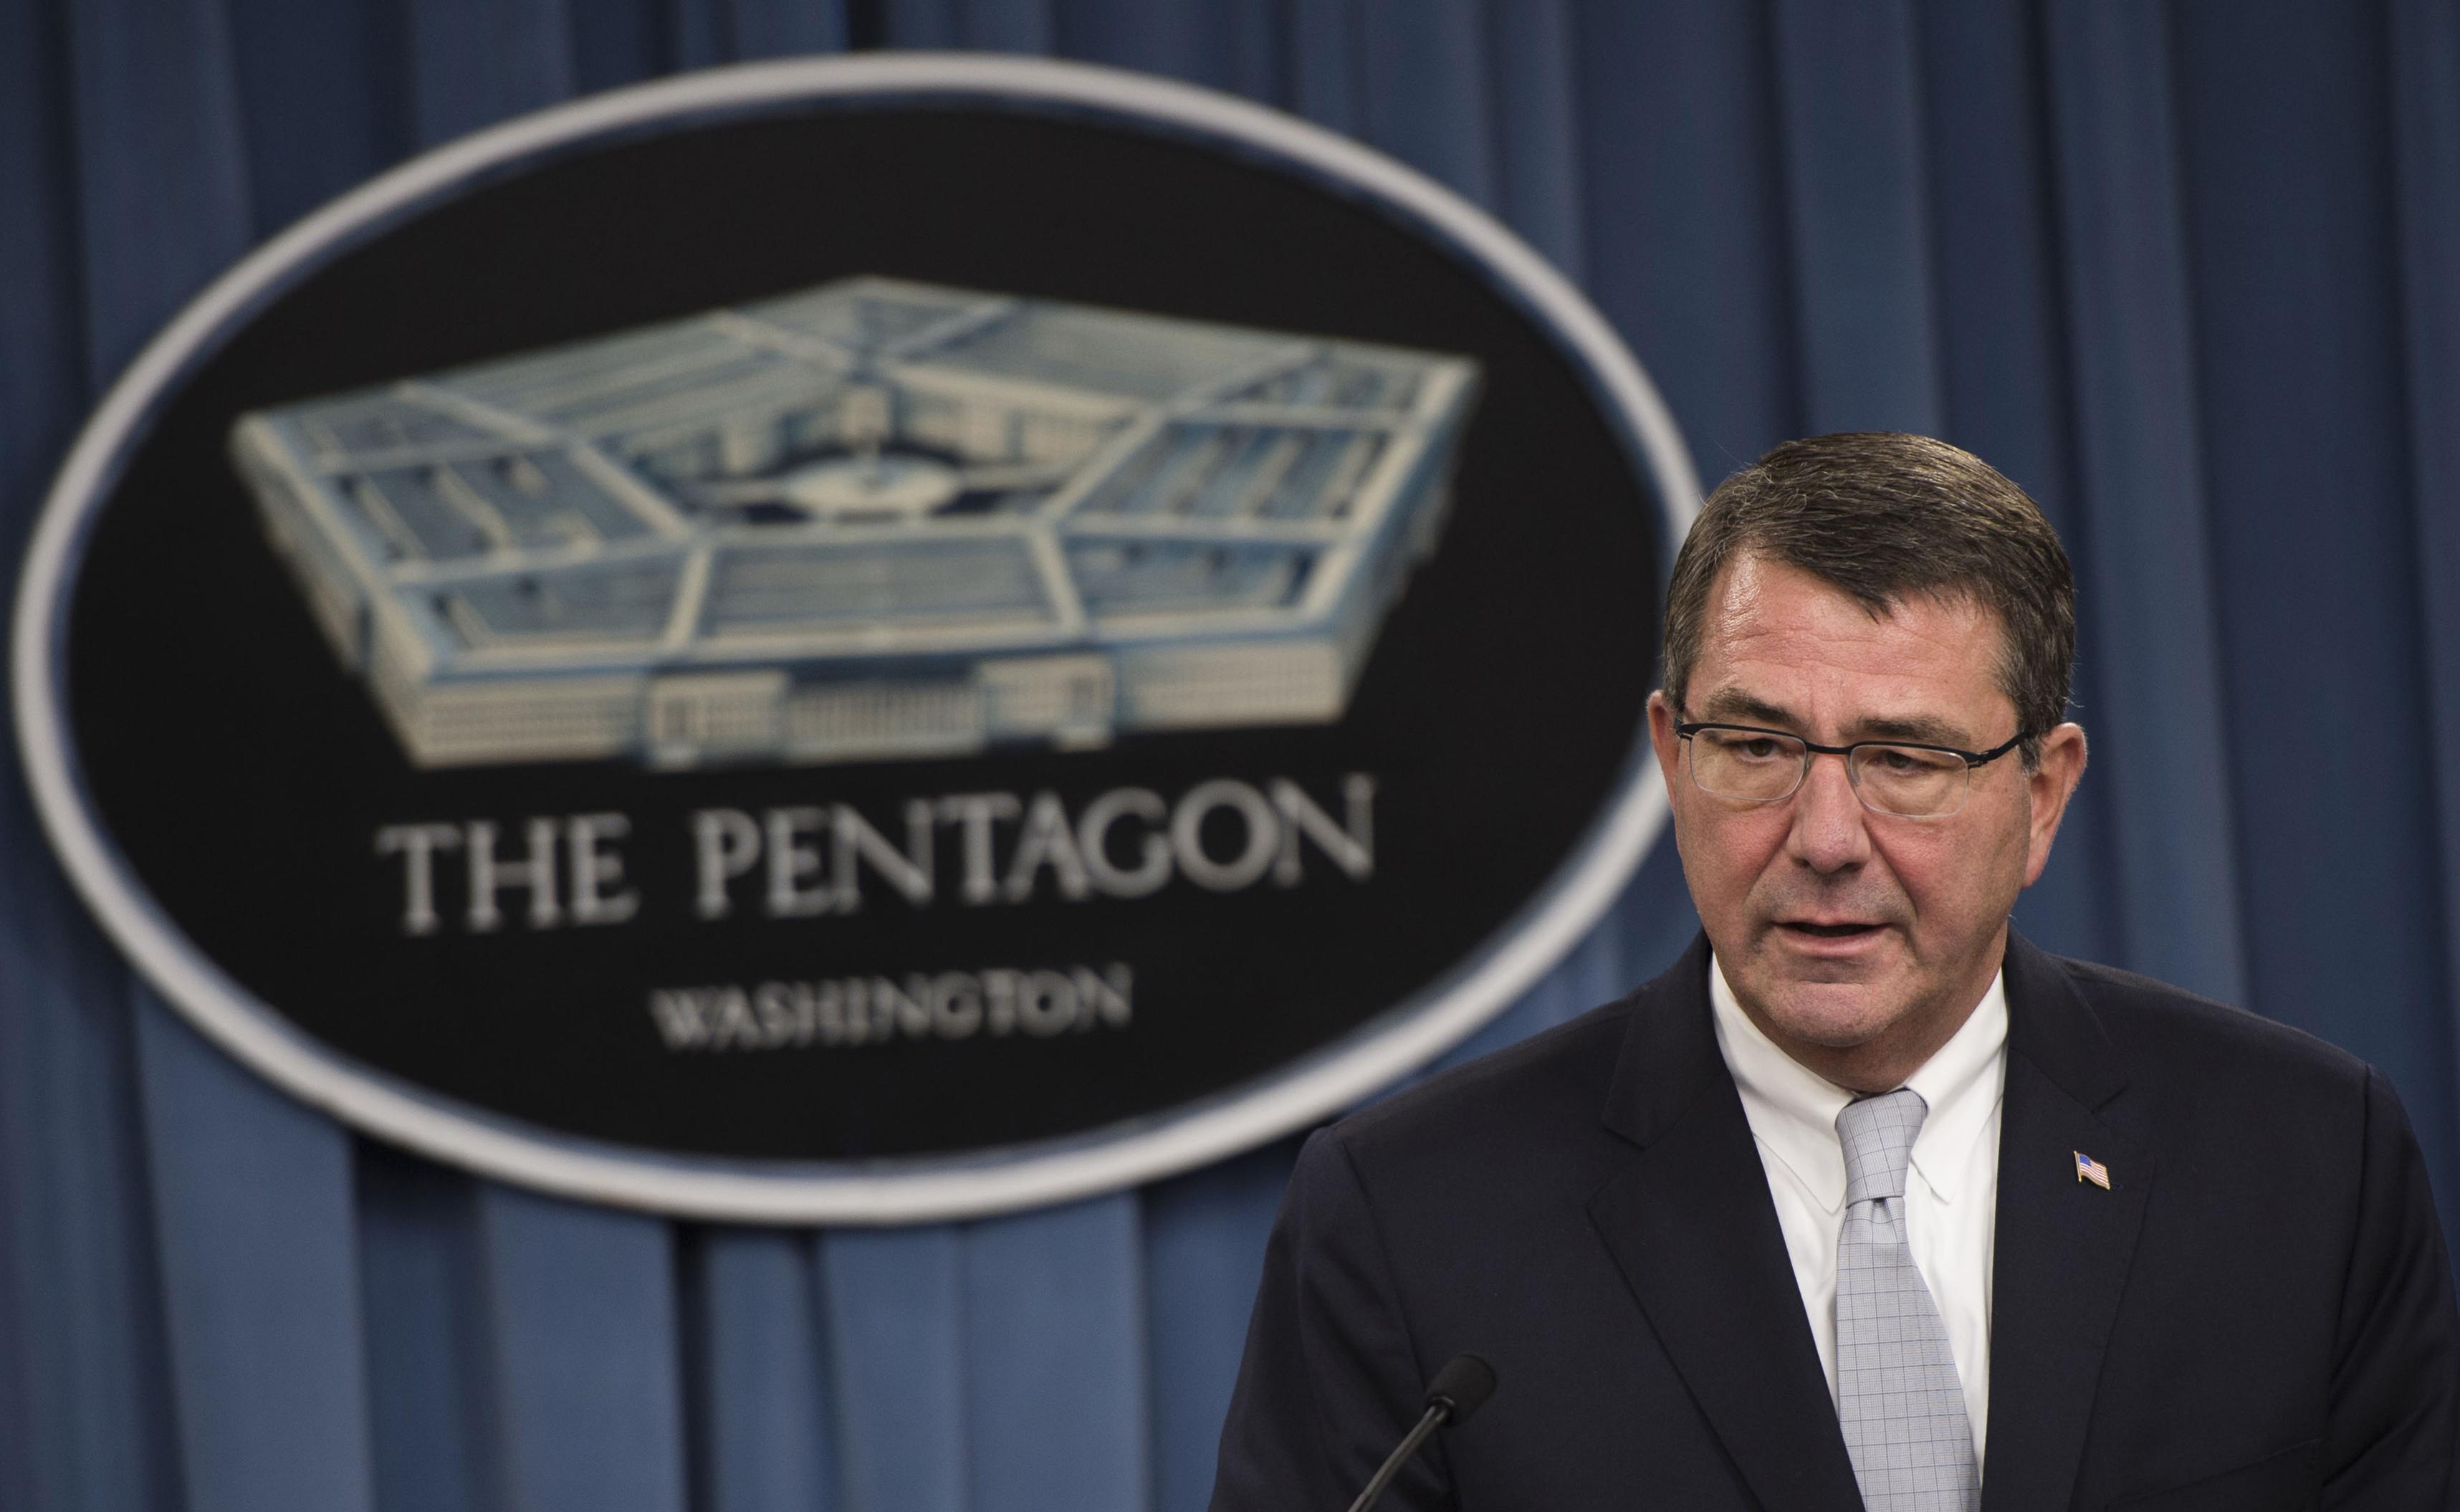 Then Deputy Secretary of Defense Ashton Carter briefs the press at the Pentagon in Arlington, Va., on Sept. 25, 2013. DoD Photo